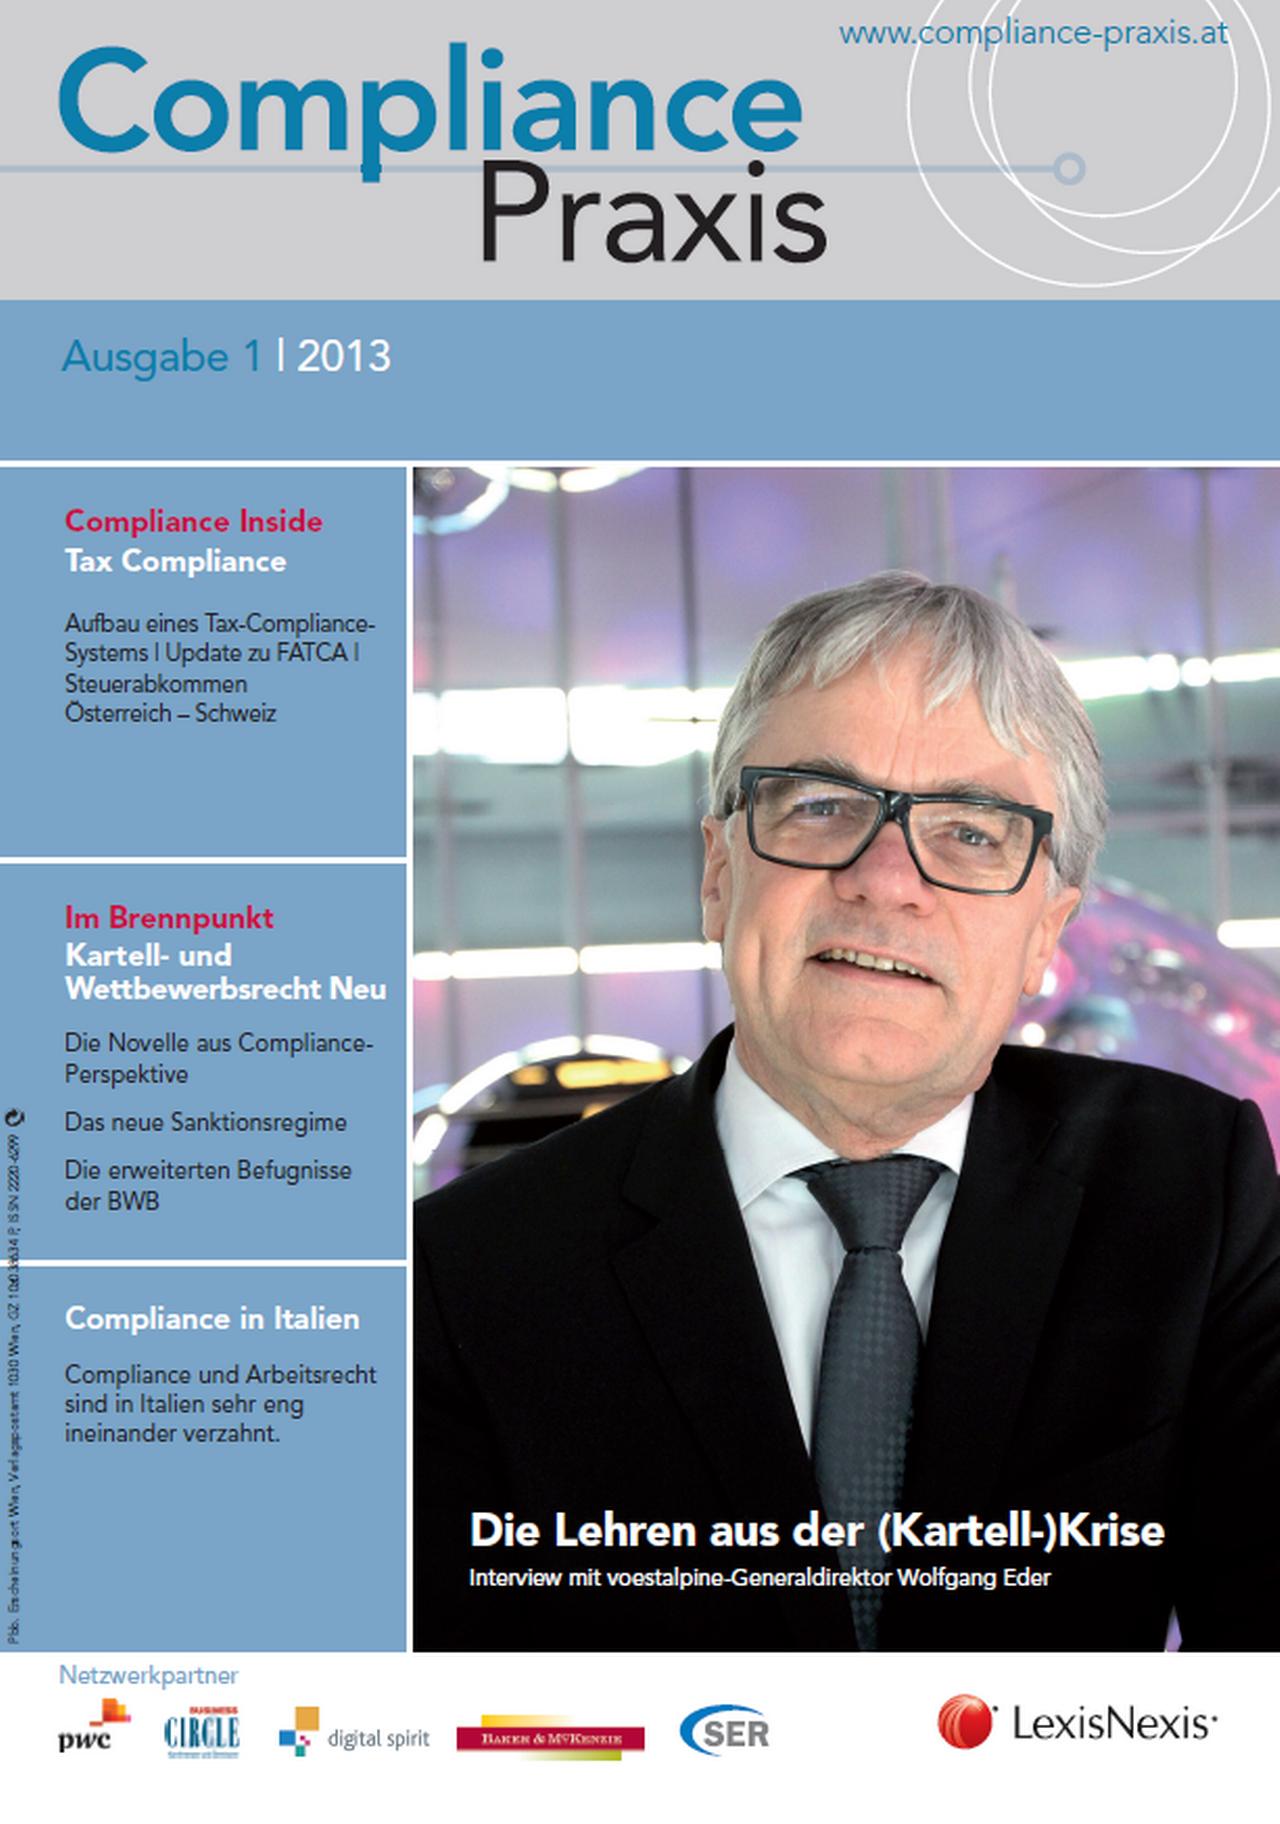 Cover von Compliance Praxis Ausgabe 1/2013, © LexisNexis